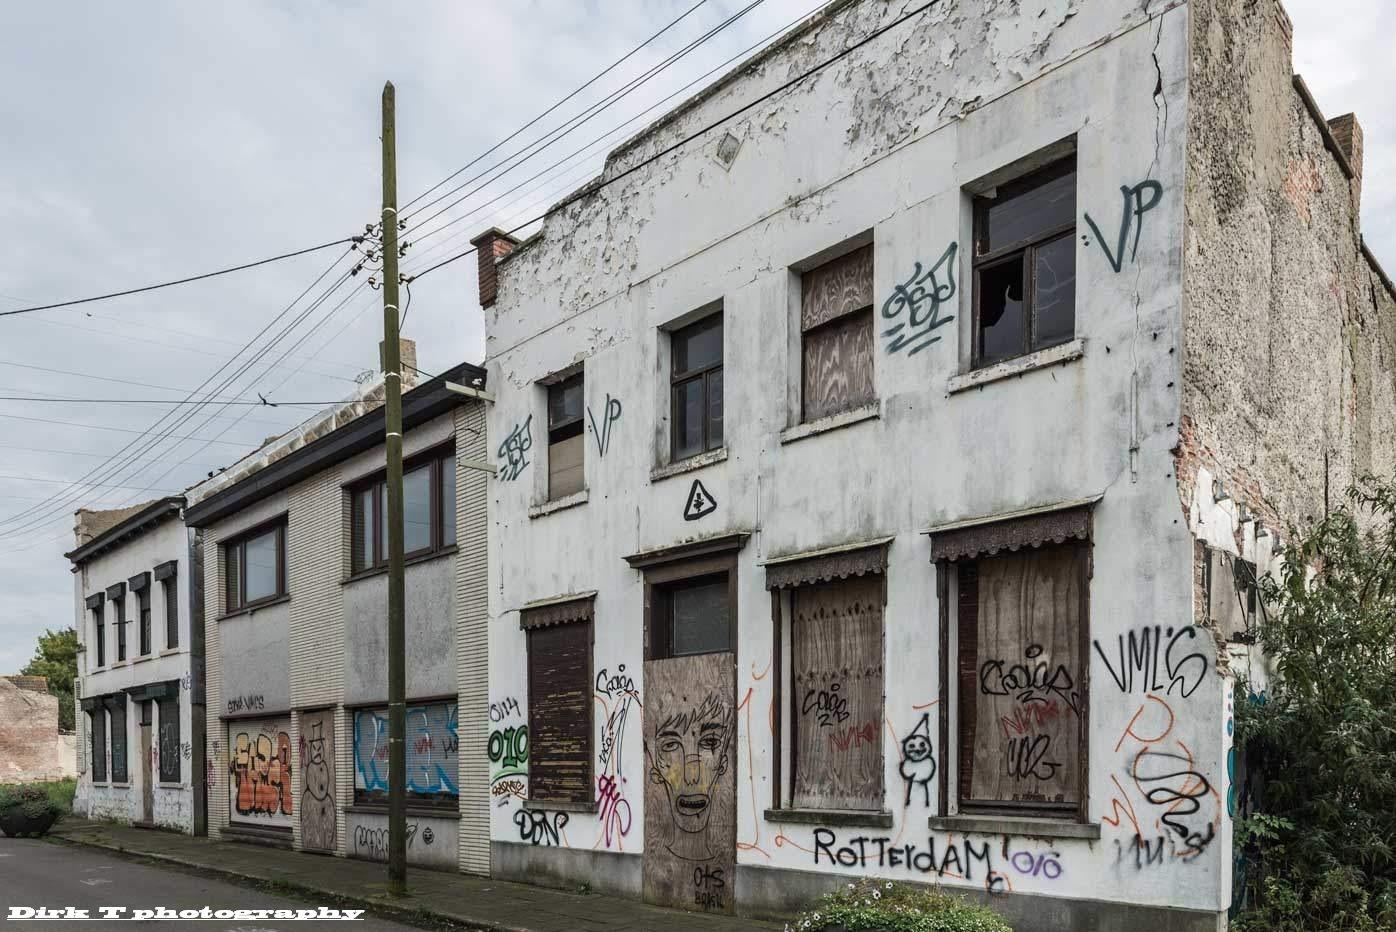 Ghost town Doel-Antwerp by dirktheuns